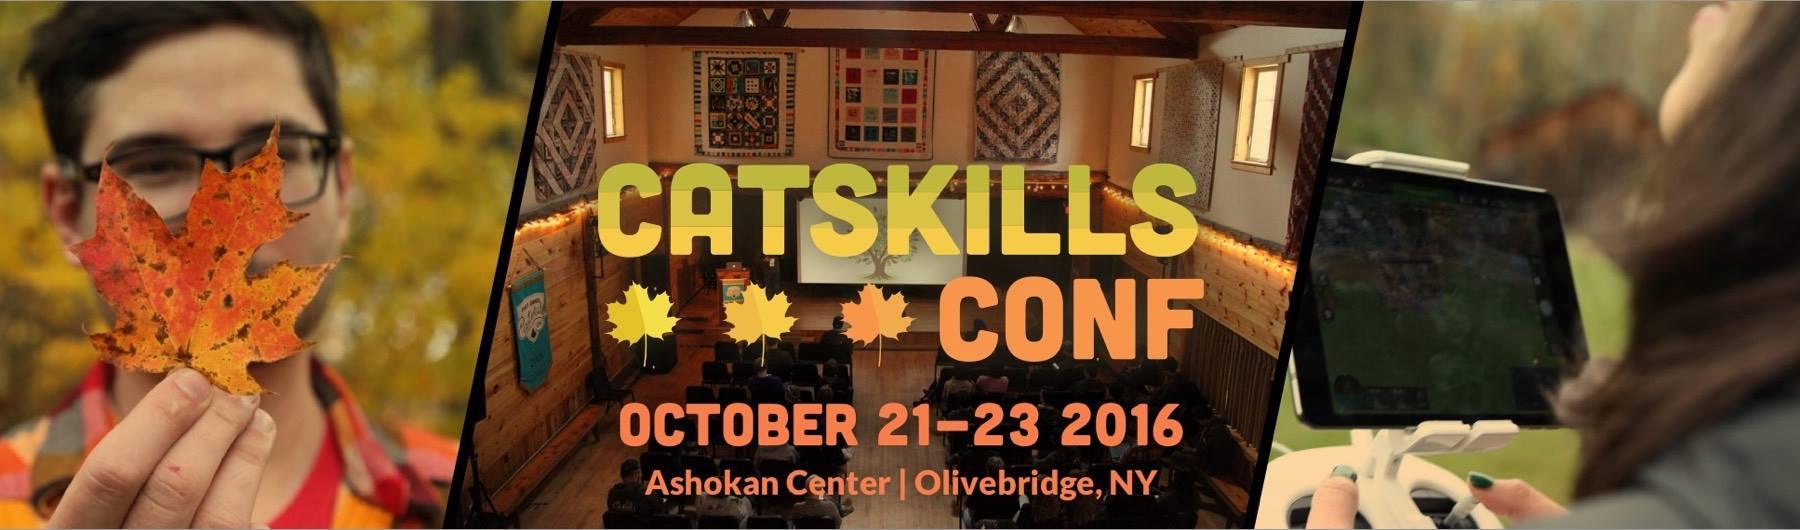 catskills conf 2016 tech